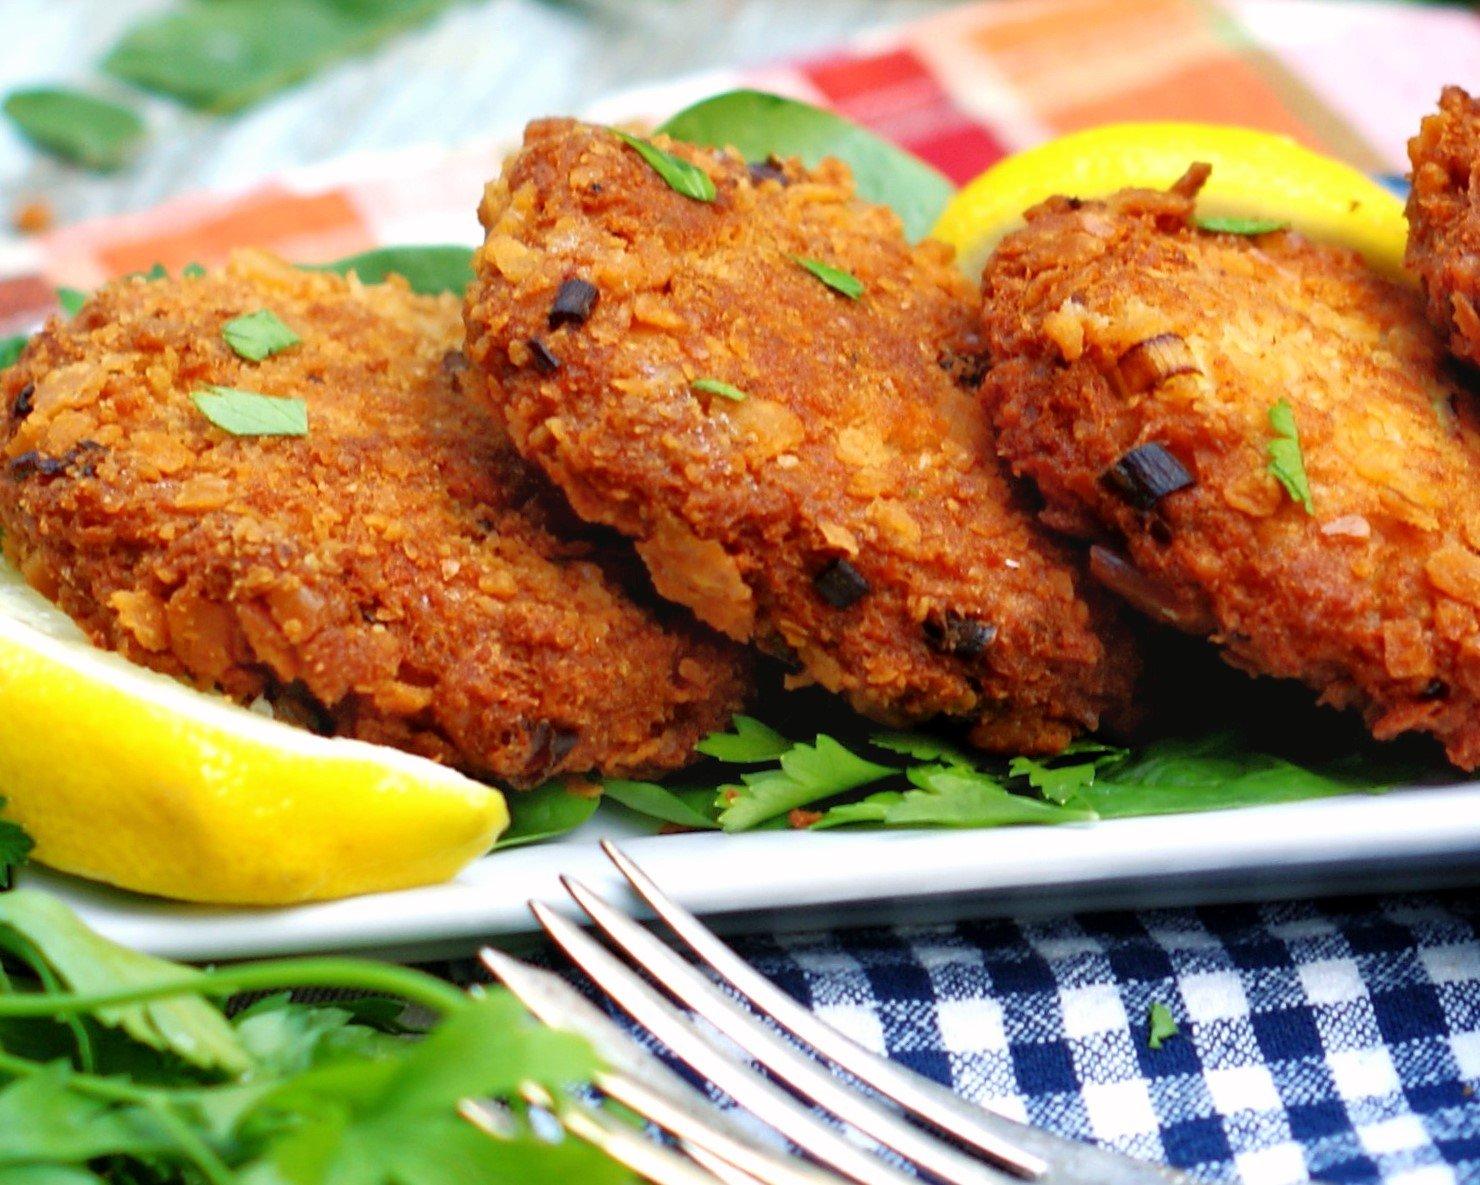 Salmon patties with lemon for dinner